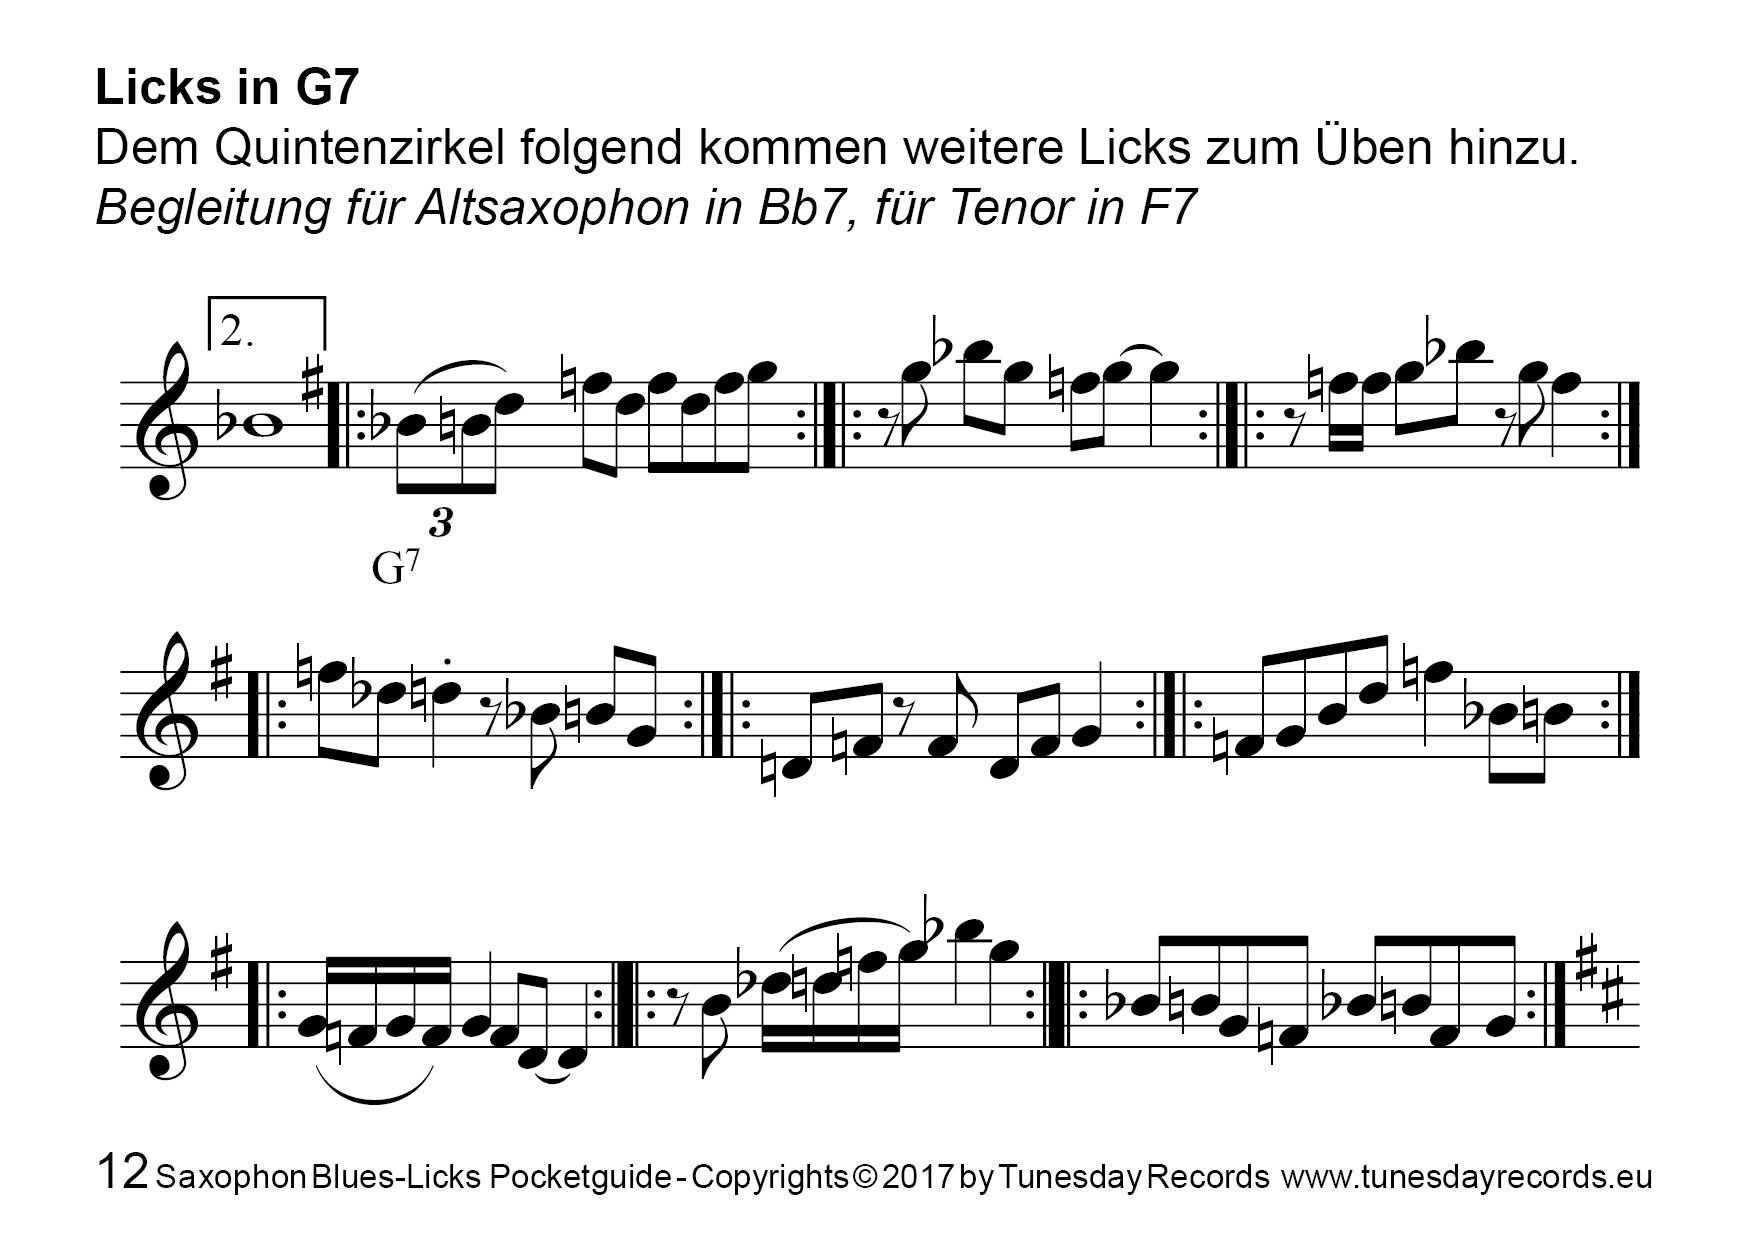 Saxophon Blues-Licks (Pocketguide mit MP3-Download) - Tunesday Records